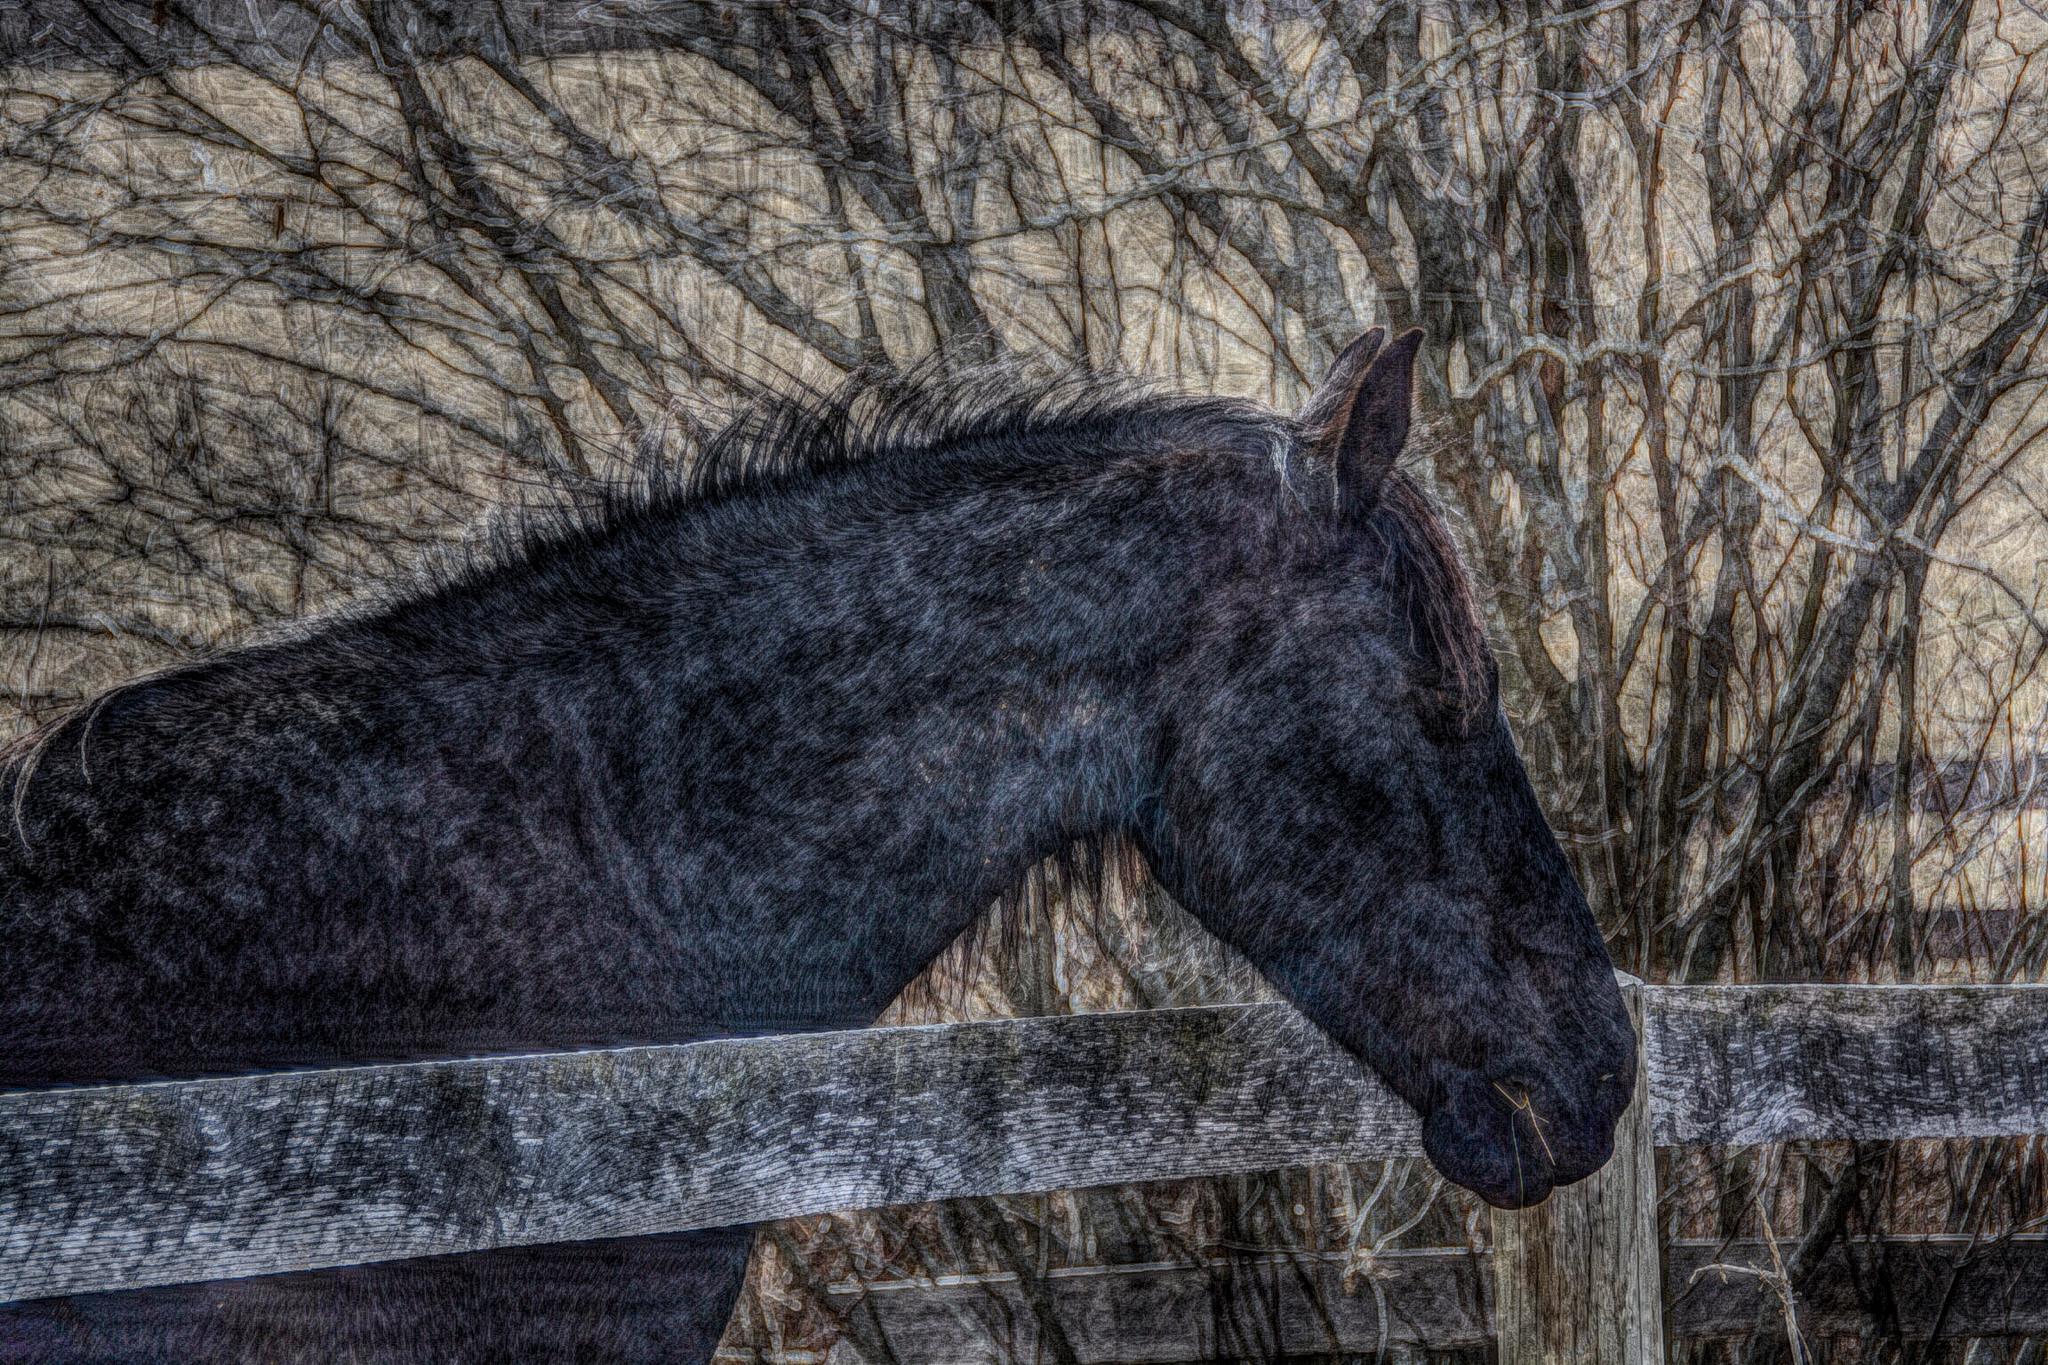 Horse near fence by bette.hileman